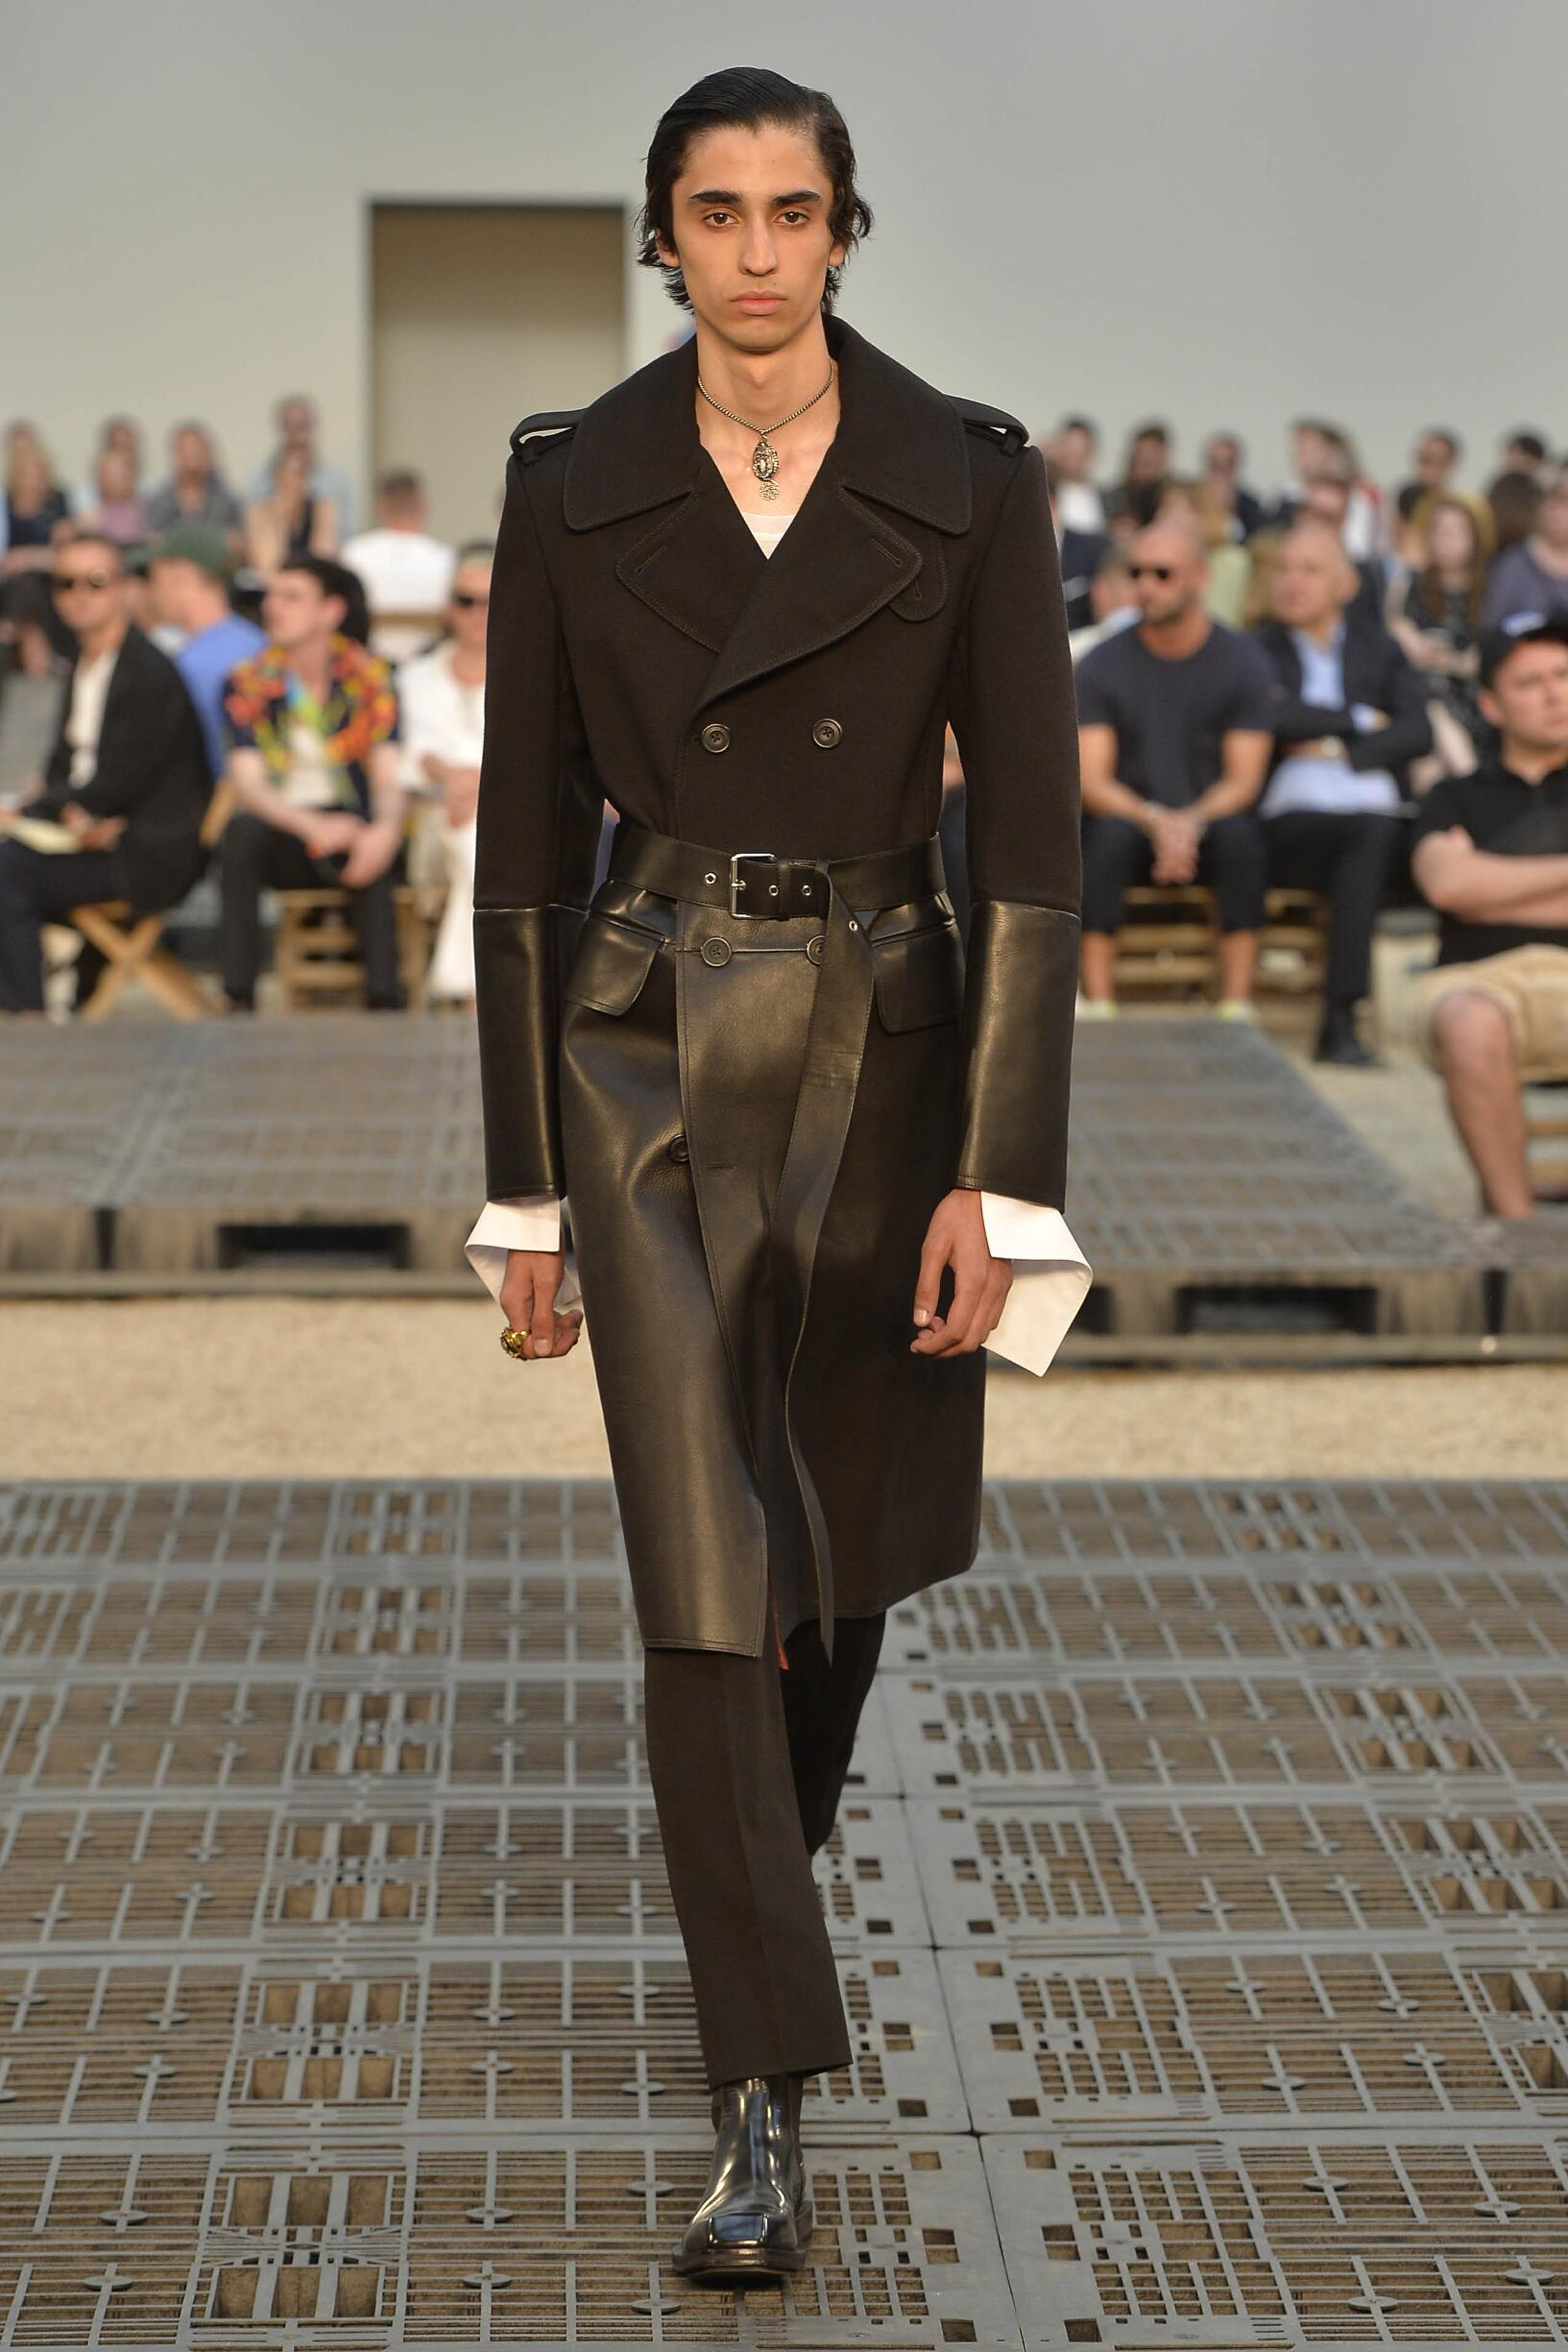 Fashion Man Model Alexander McQueen Catwalk